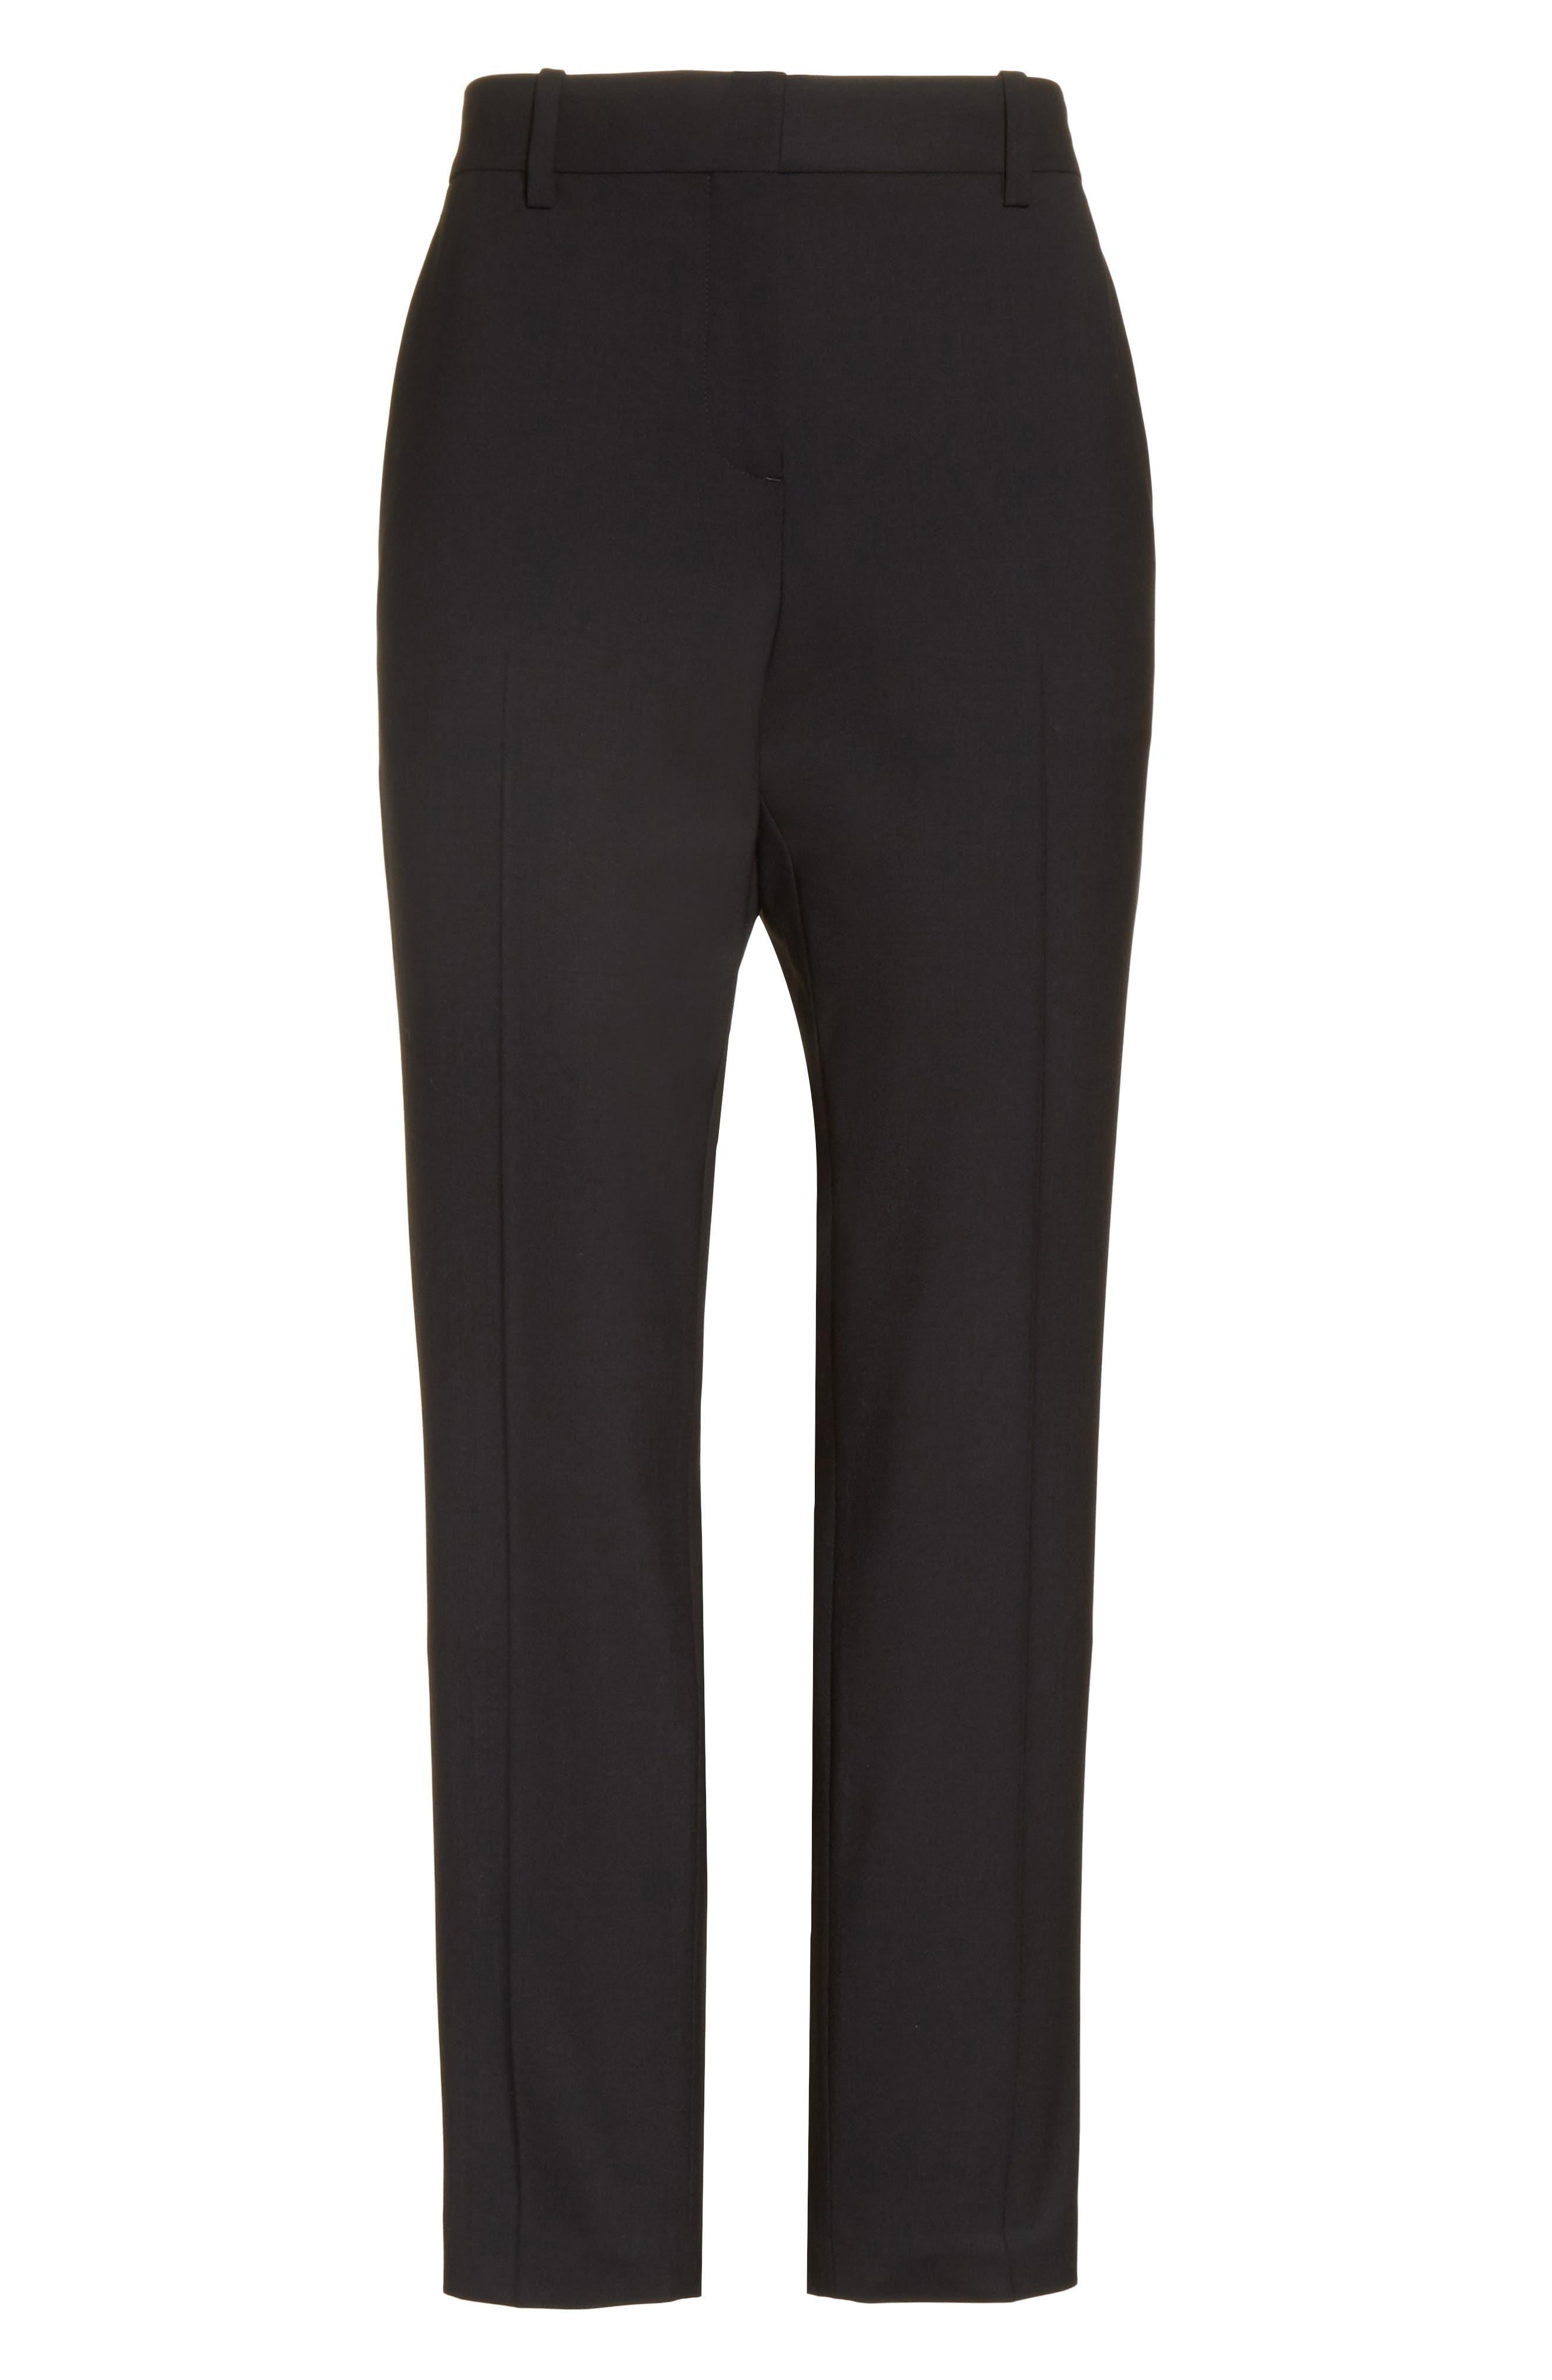 THEORY, Treeca 2 Good Wool Crop Suit Pants, Alternate thumbnail 7, color, BLACK